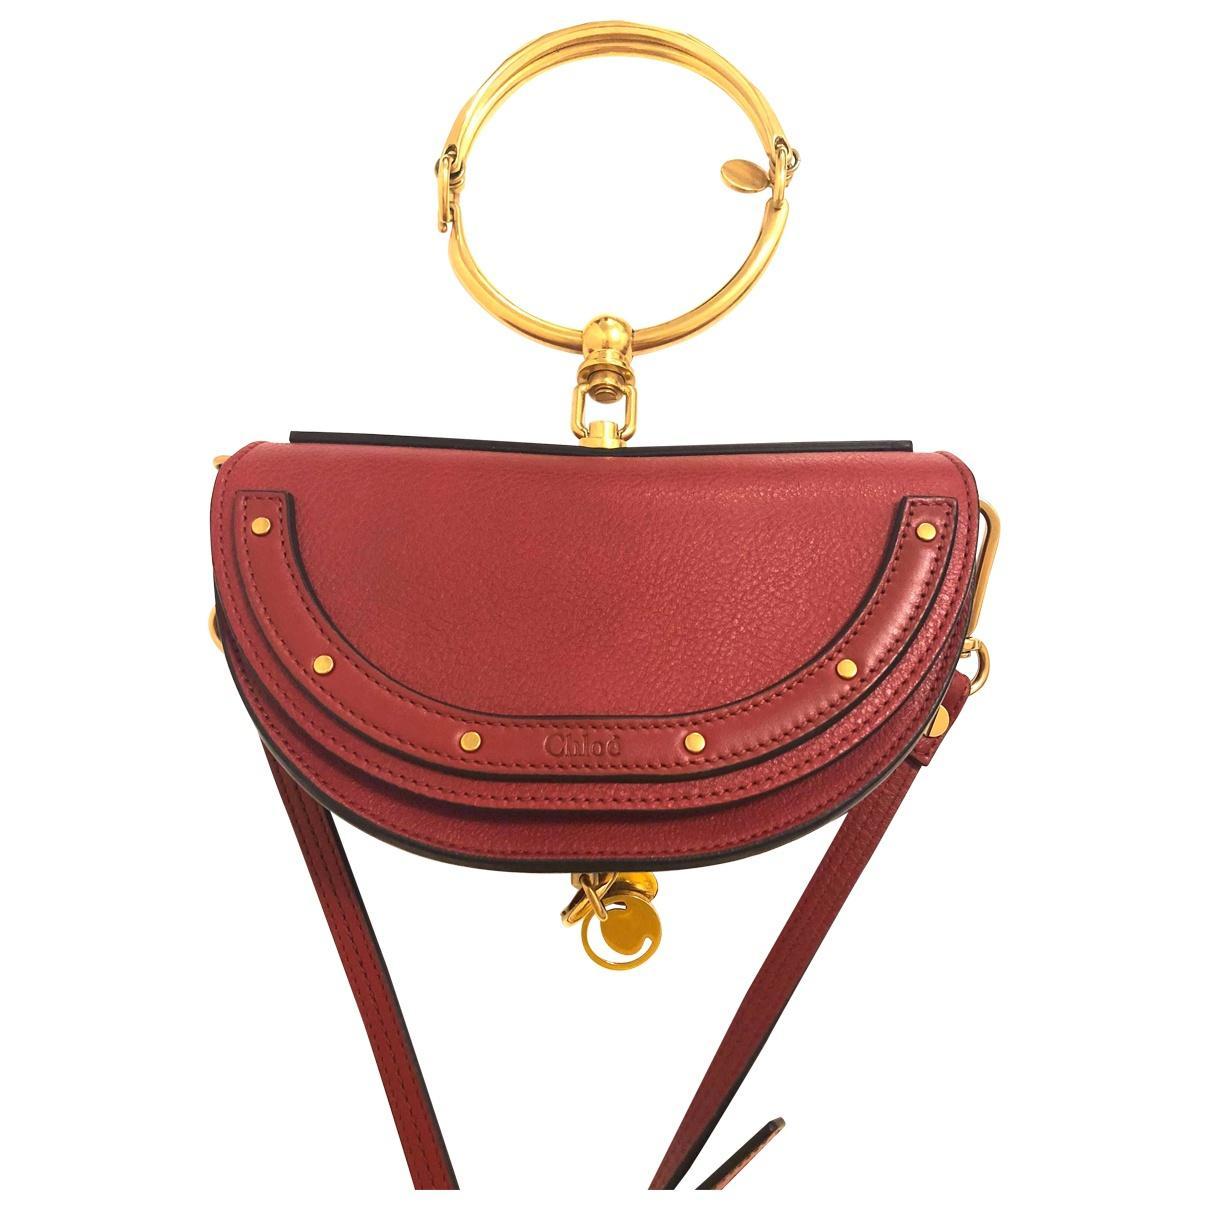 Chloé Leather Nile Minaudière Crossbody Bag in Red